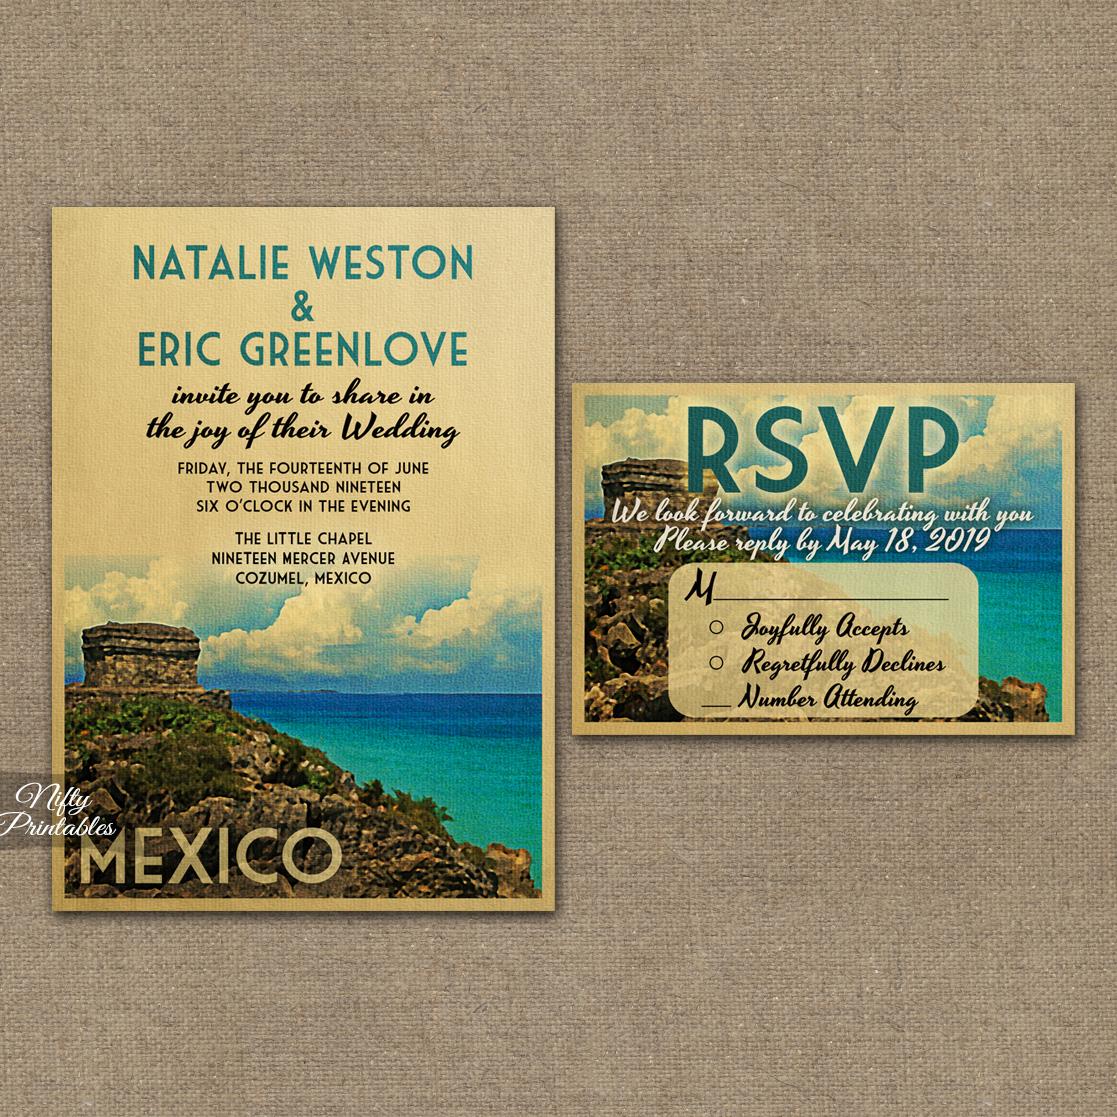 Tulum Mexico Wedding Invitations VTW